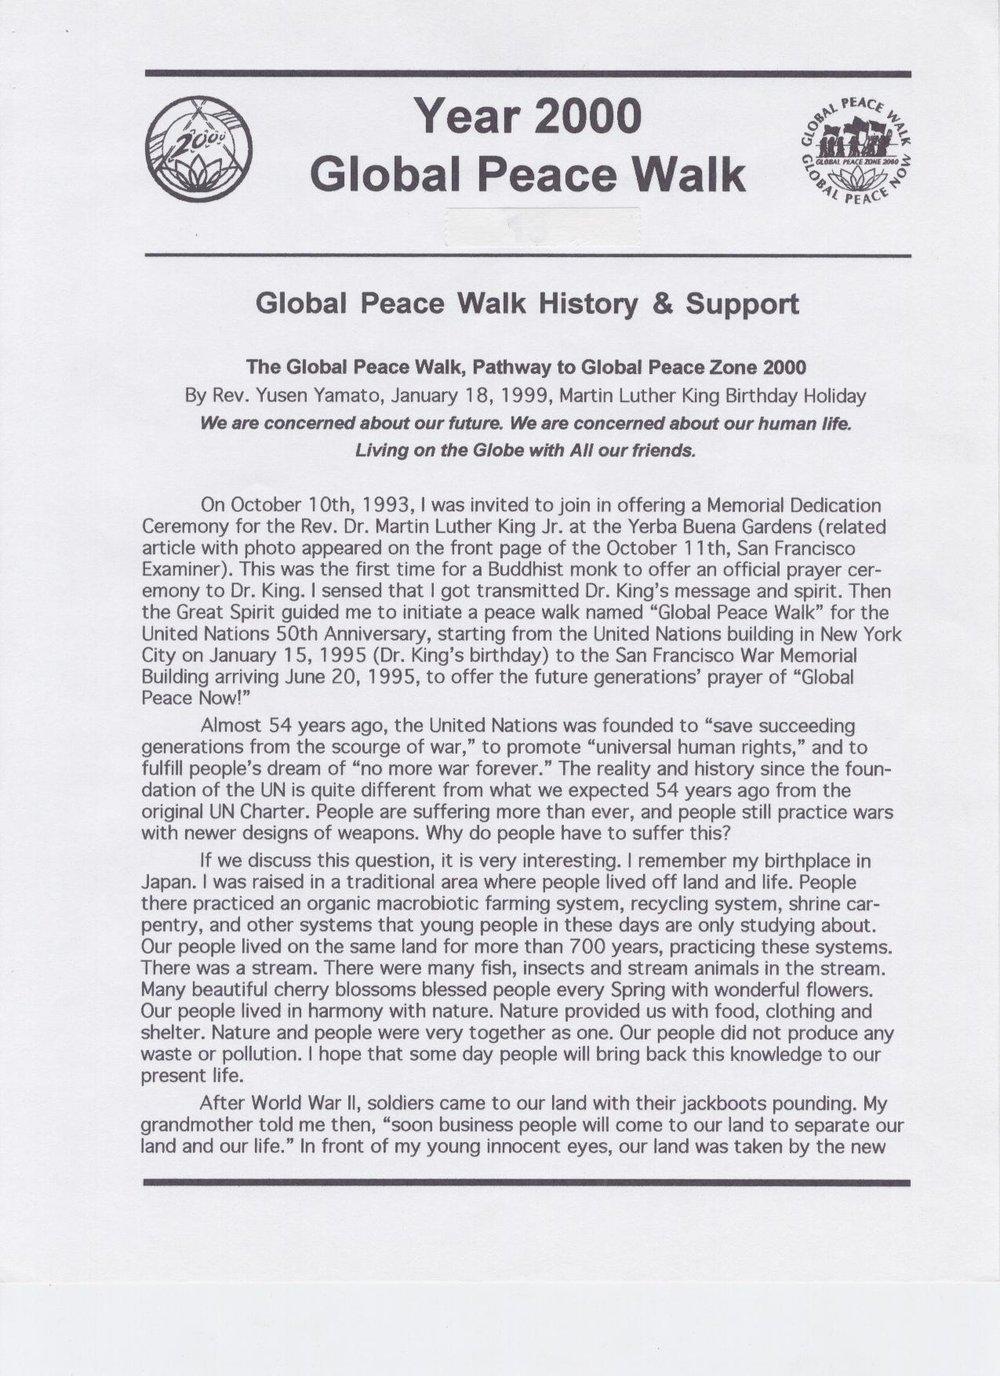 Global Peace History -